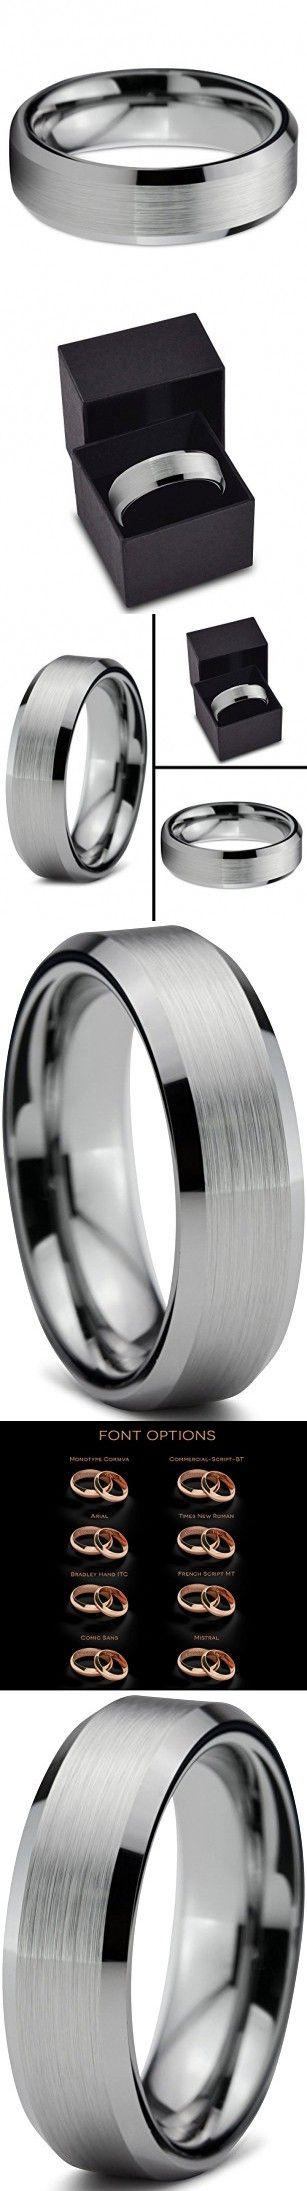 Tungsten Wedding Band Ring FREE Custom Laser Engraving 6mm for Men Women Silver Grey Beveled Edge Brushed Comfort Fit Lifetime Guarantee